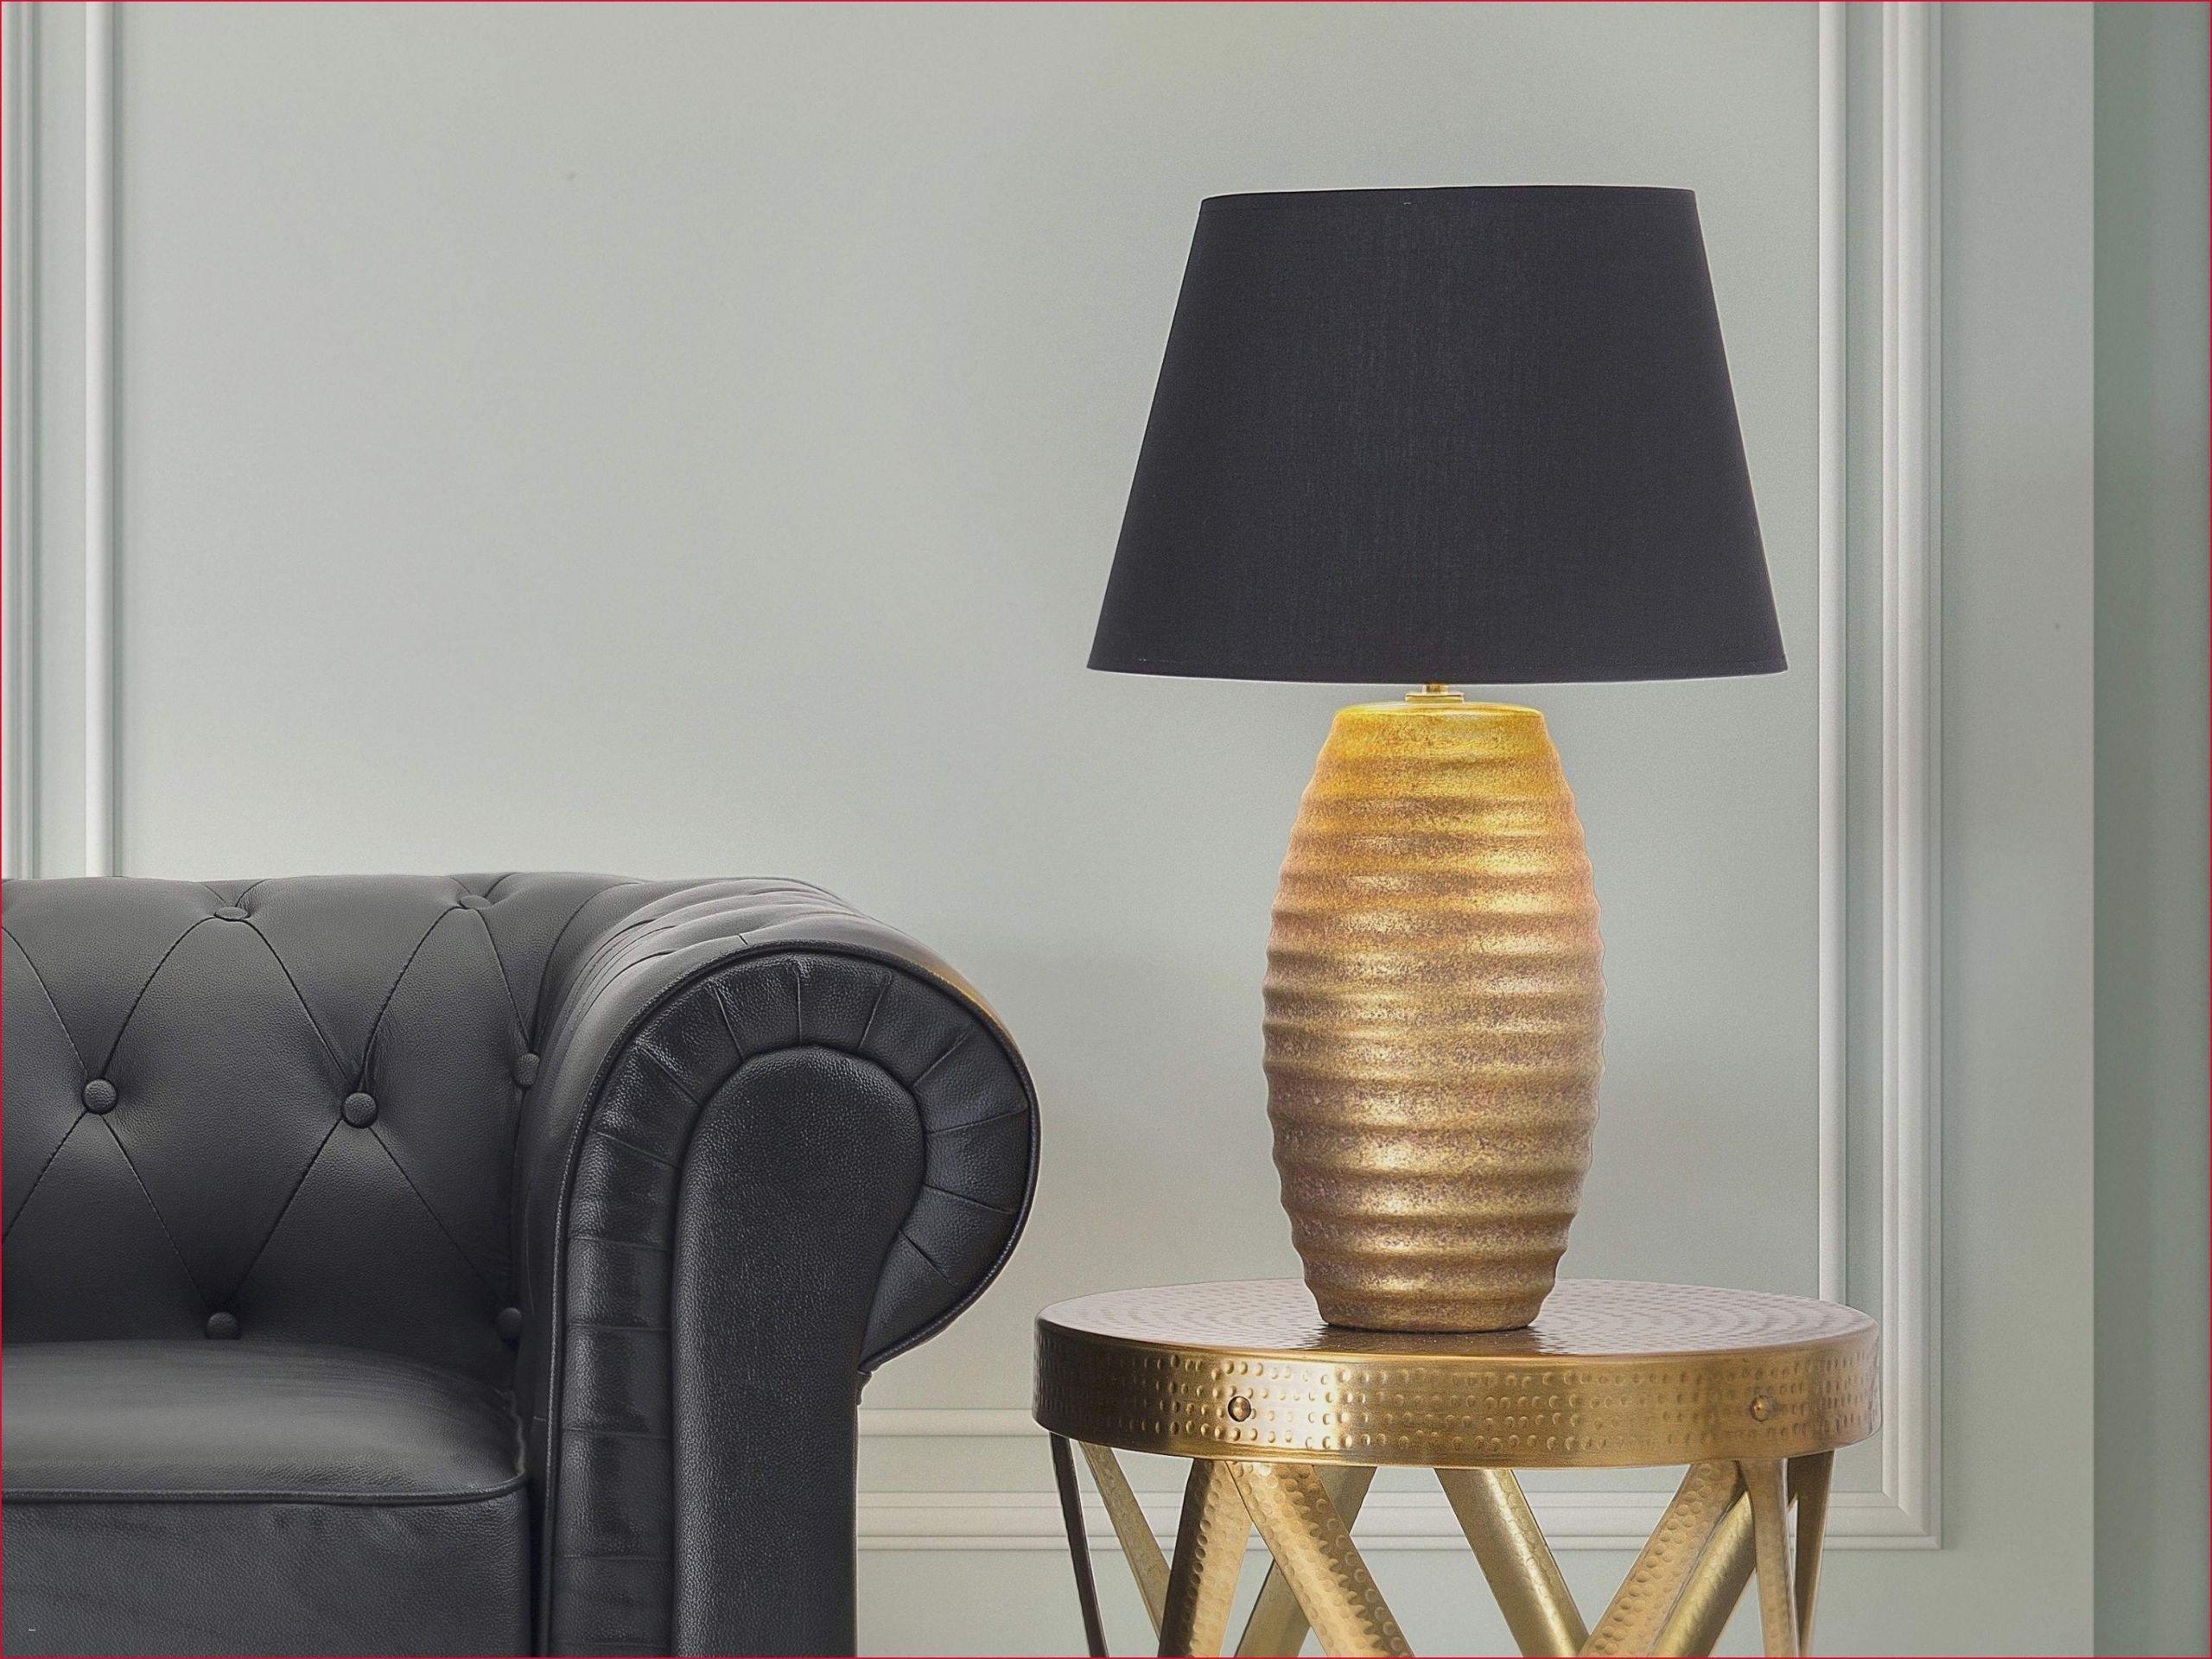 Full Size of Designer Wohnzimmer Lampen Wohnzimmer Lampen Design Wohnzimmer Lampen Messing Wohnzimmer Lampen Led Dimmbar Wohnzimmer Wohnzimmer Lampen